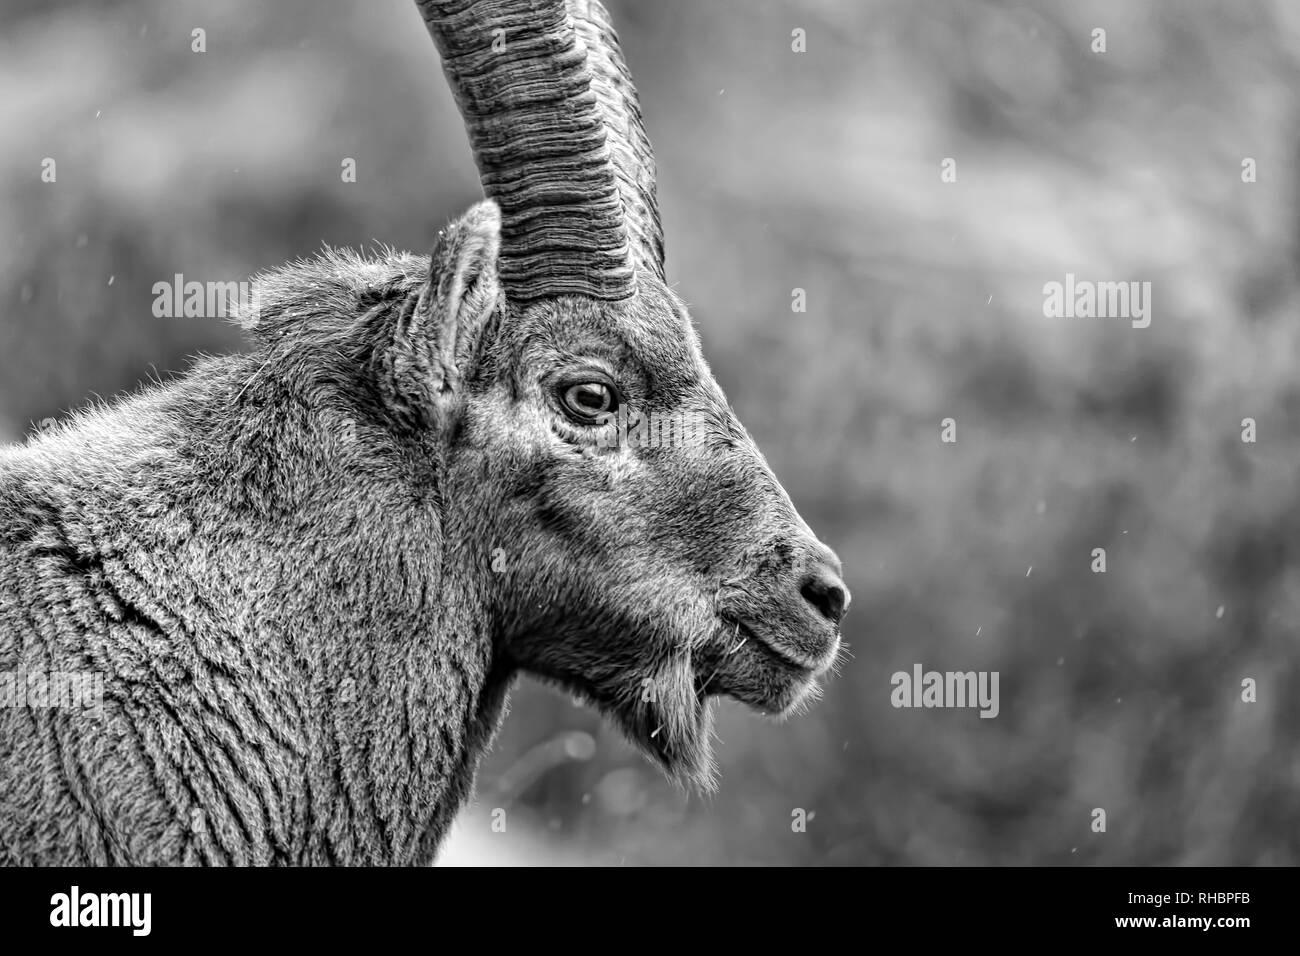 Wonderful portrait of Alpine ibex in the Alps (Capra Ibex), black and white photos - Stock Image